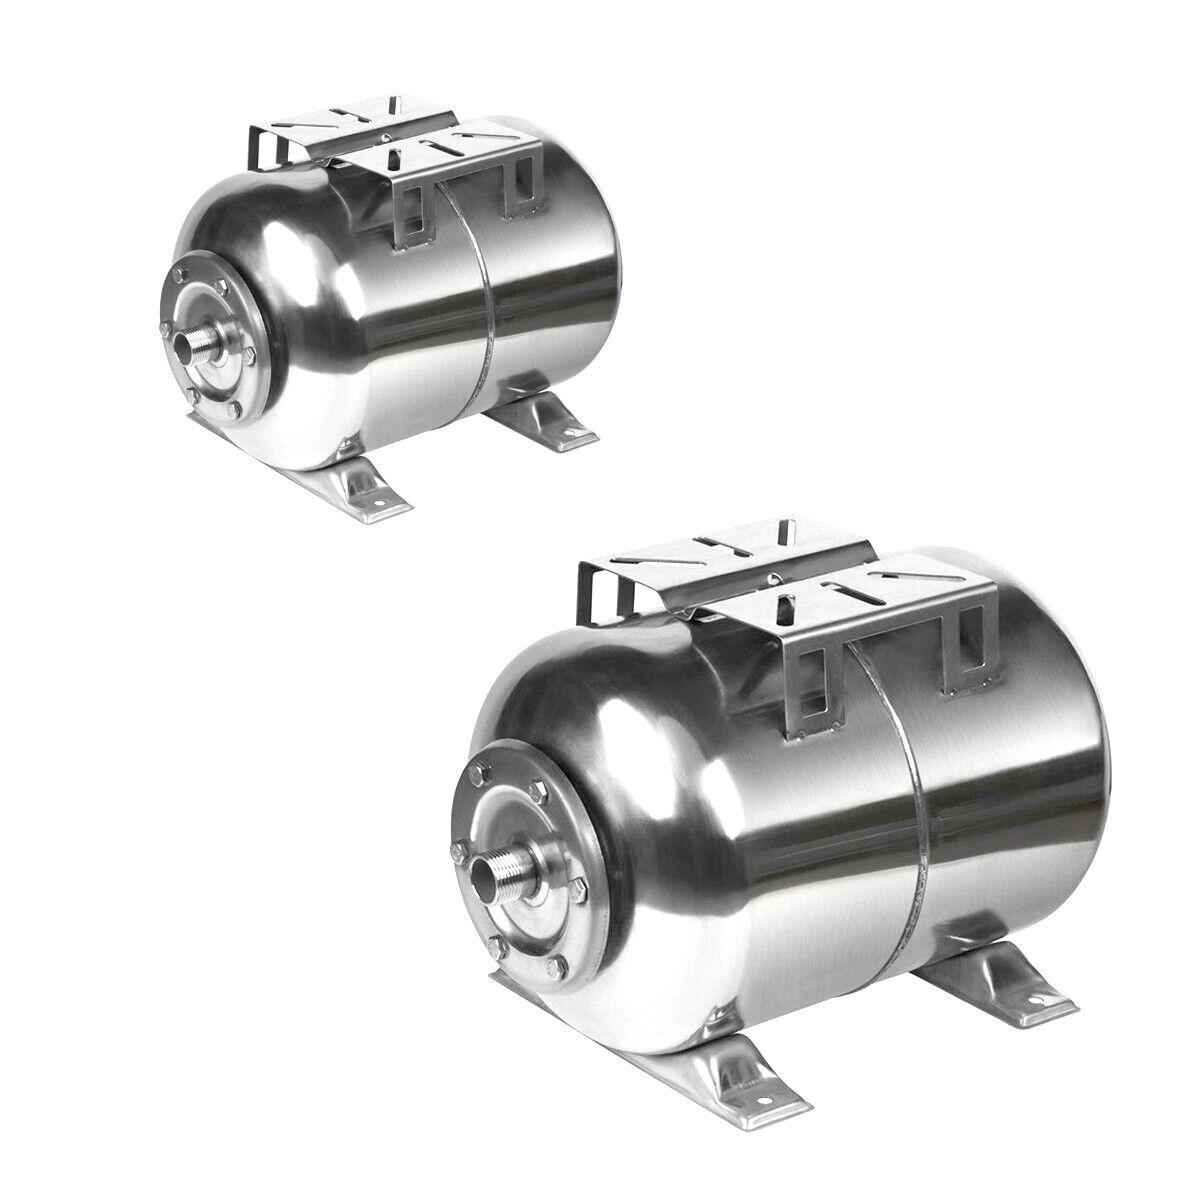 Edelstahl Membrankessel 24l 50l Druckkessel INOX Druckbehälter Kessel Membrane